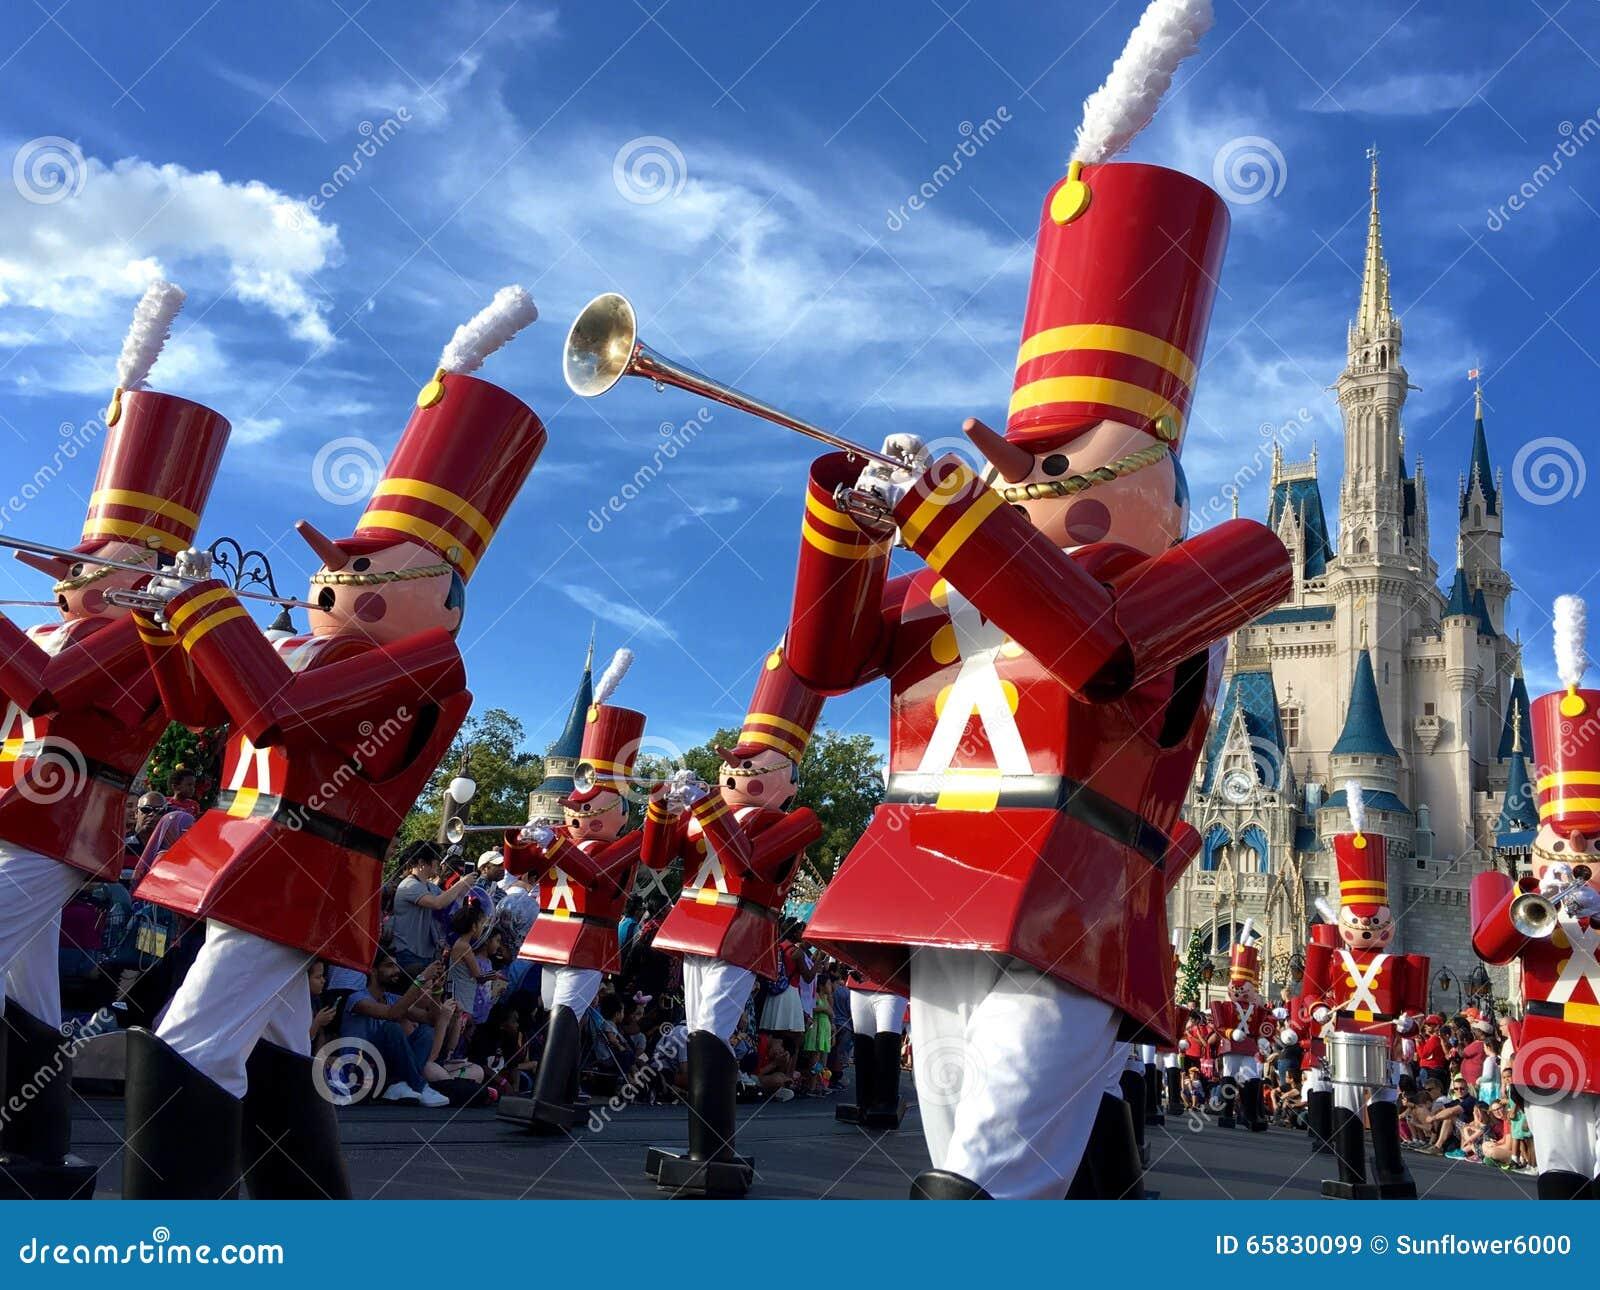 Walt Disney World Chistmas Holidays Parade Editorial Stock ...